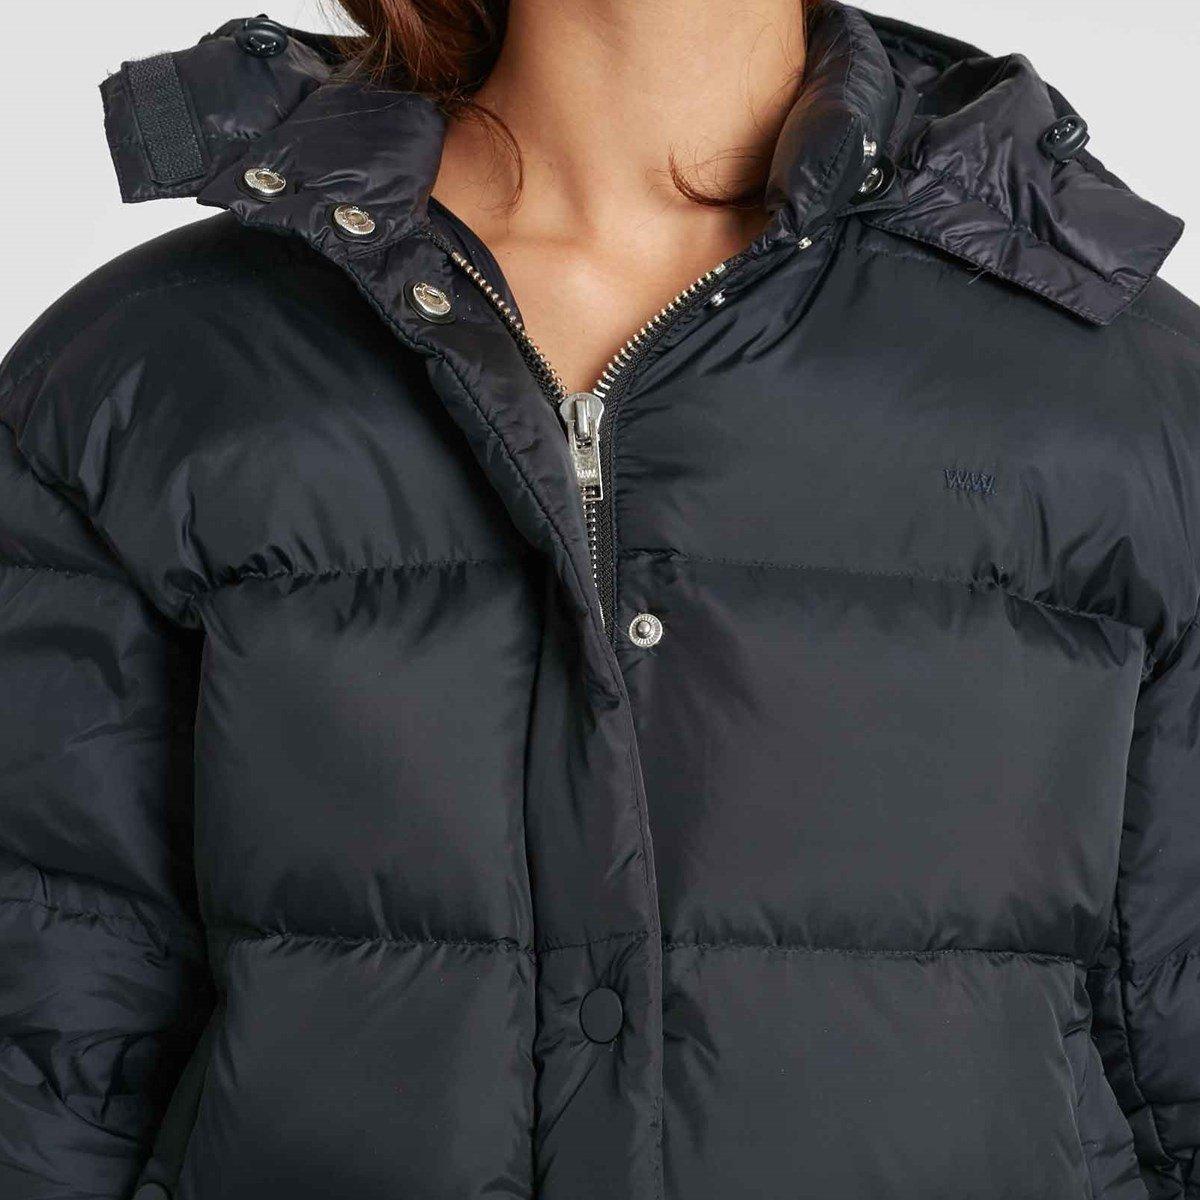 NEU Salewa Wooden 2L Hoody Jacket Softshell Wolljacke Trachtenjacke Herrenjacke